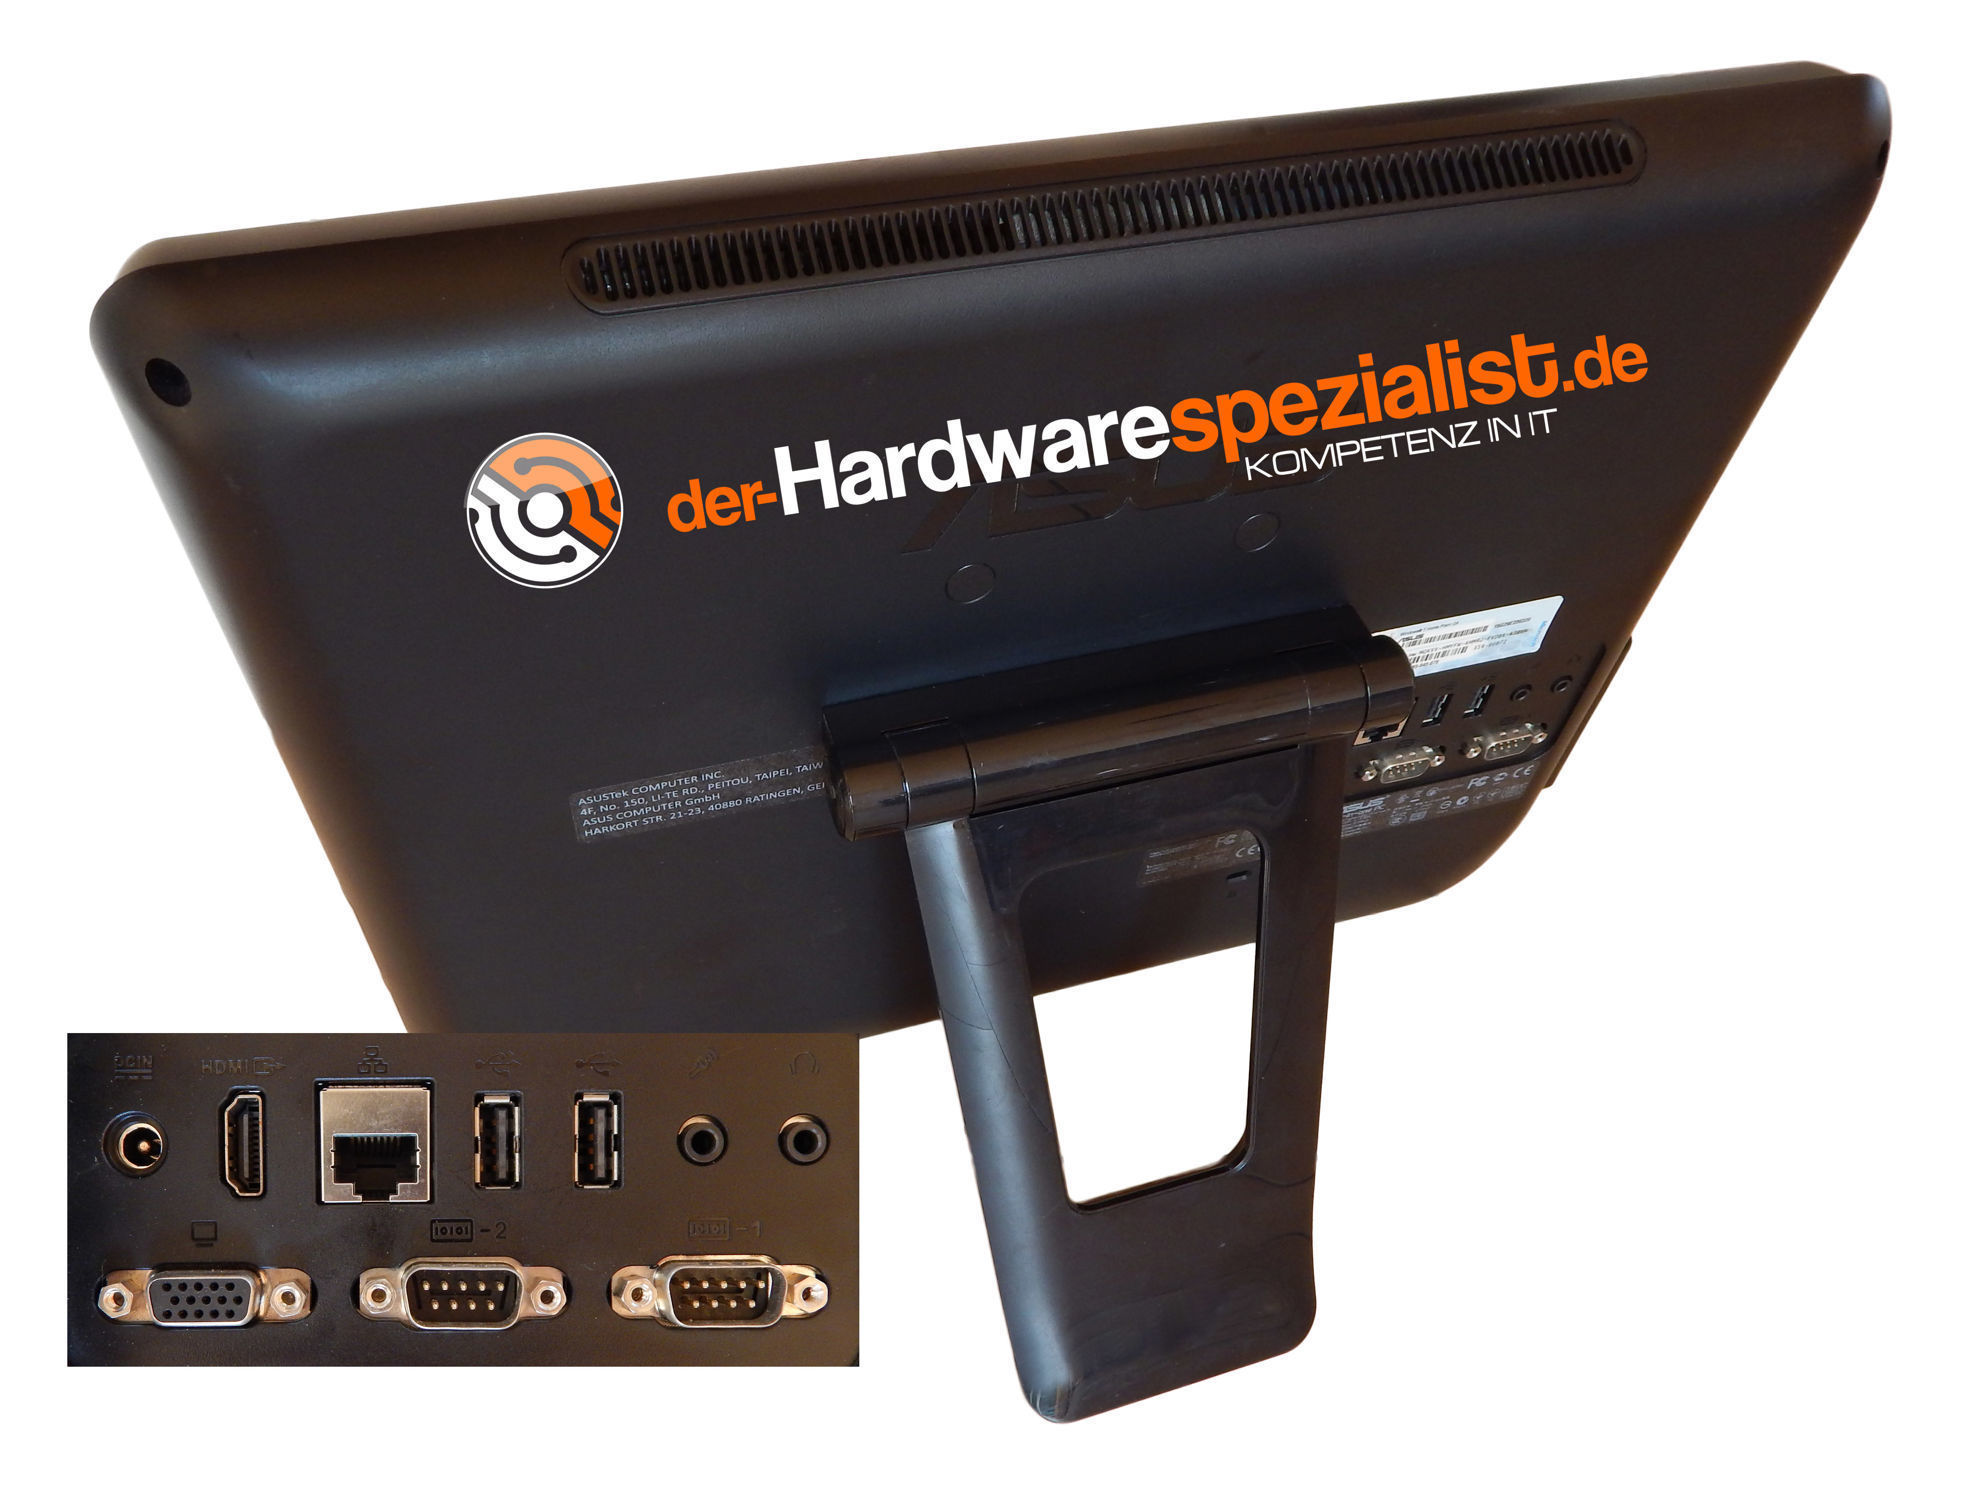 Bild von Asus EeeTop ET1612IUTS (WIN10 US+HDD) All in One PC POS TouchComputer Kassensystem (Generalüberholt)